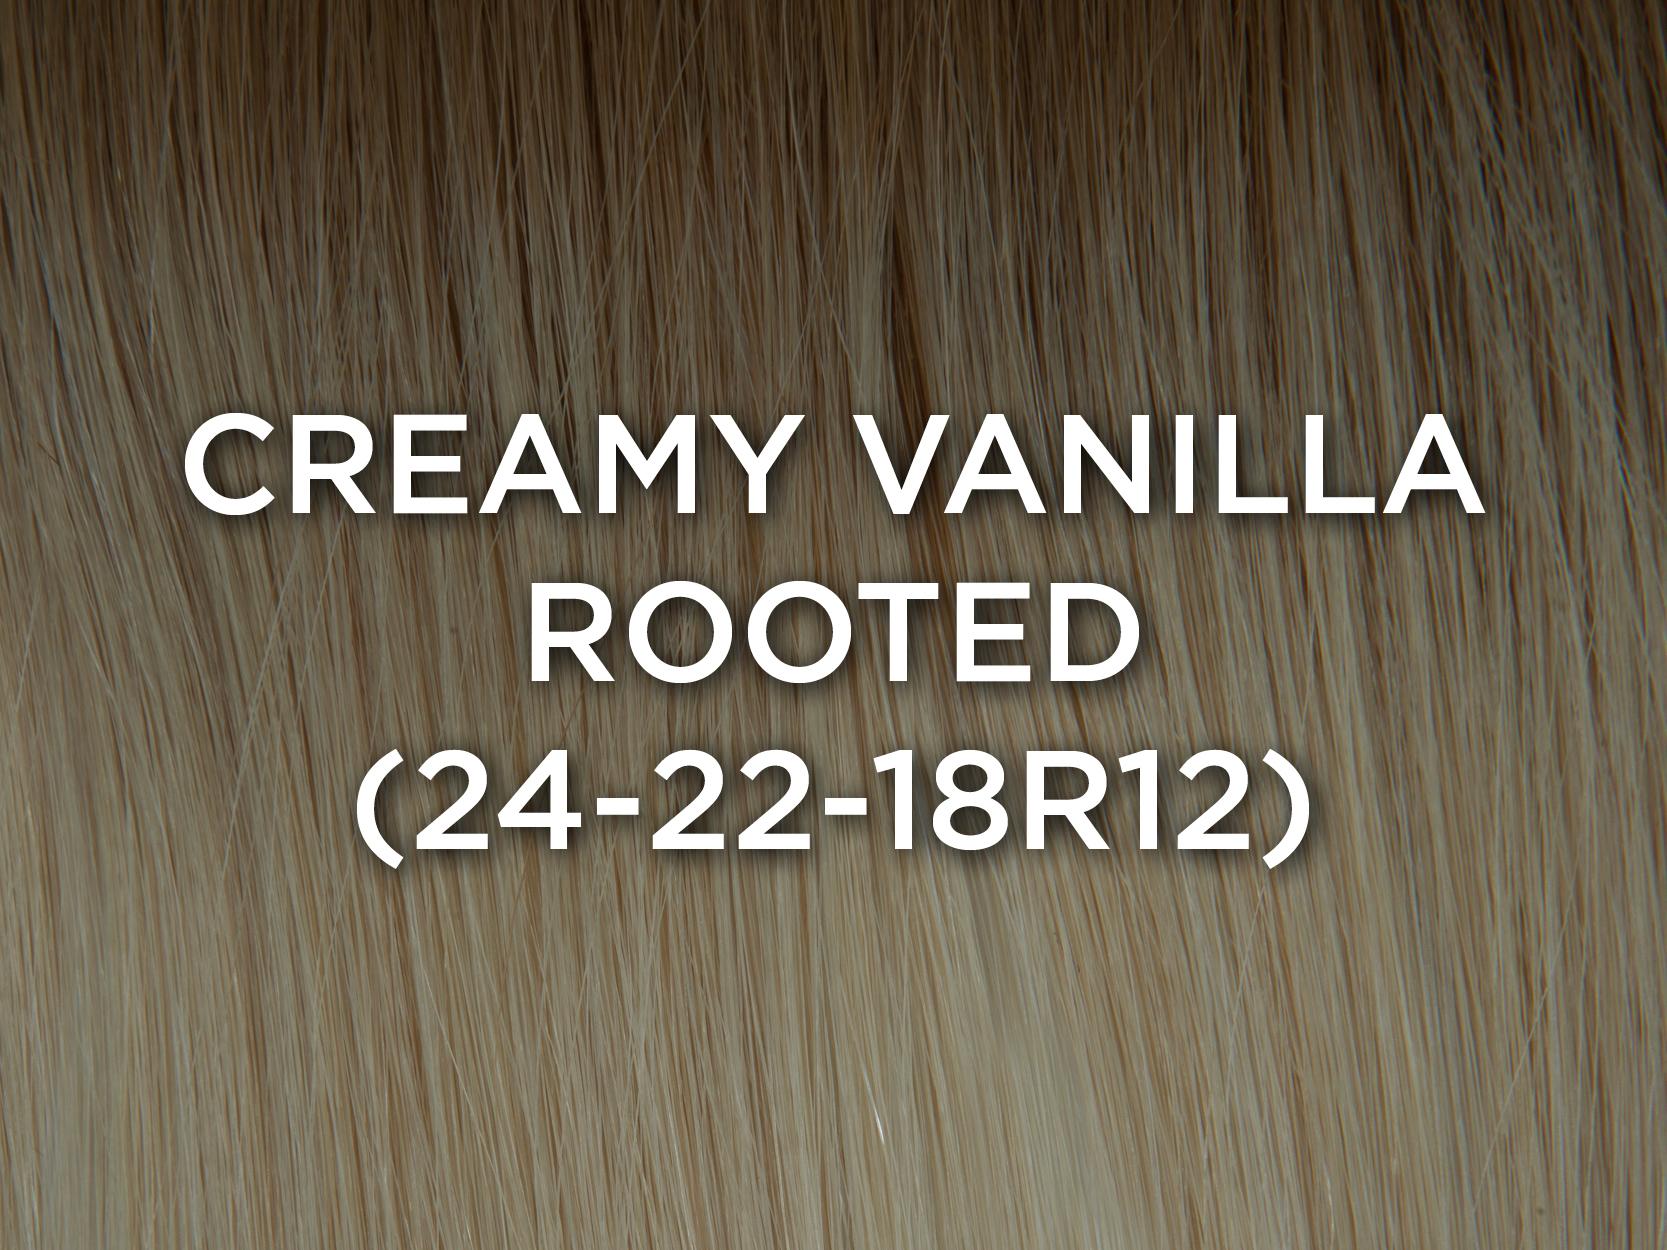 CreamyVanillaRooted.jpg